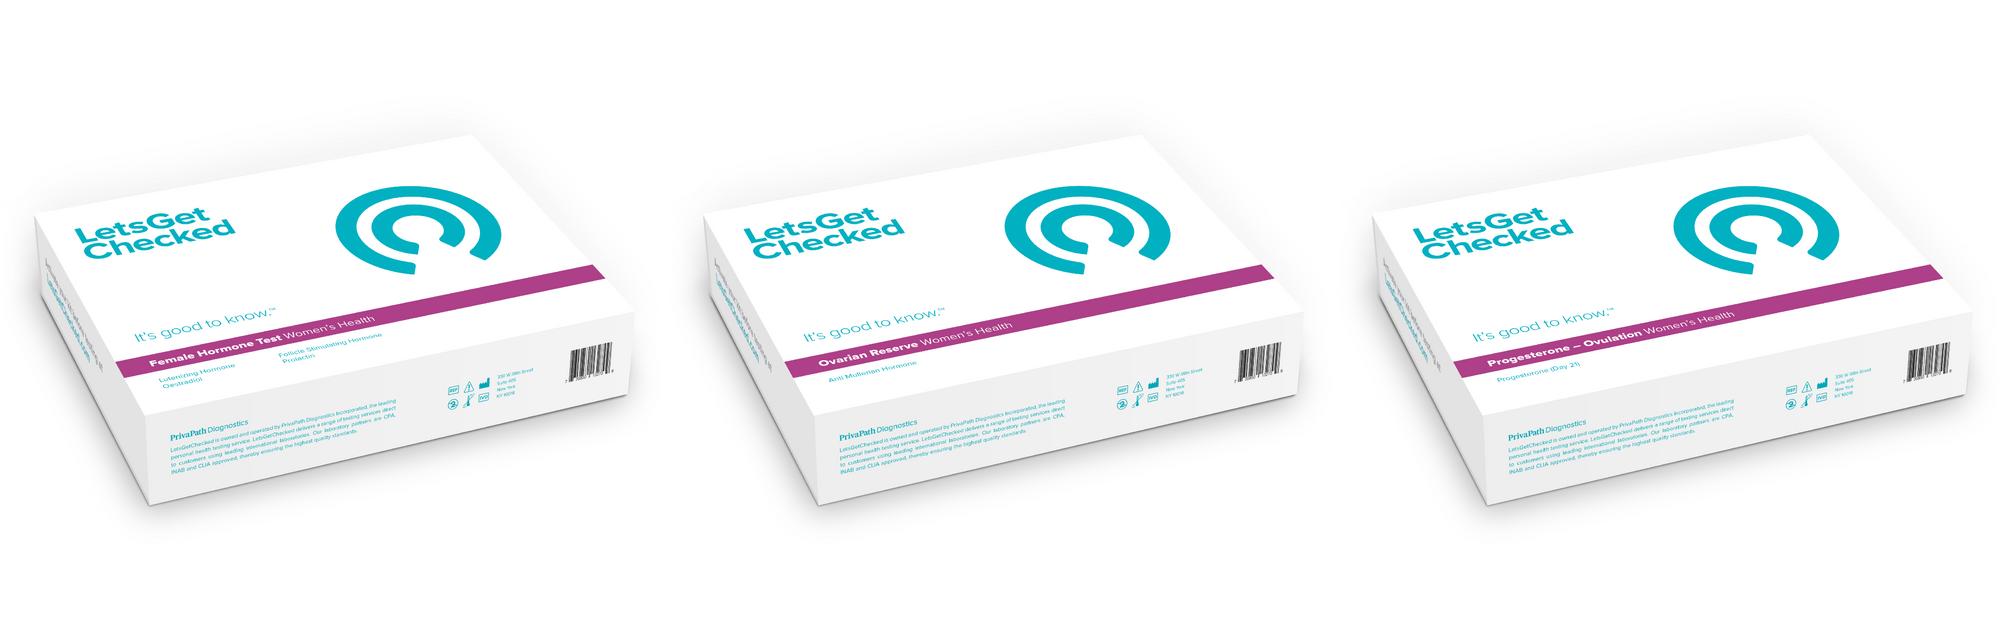 estrogen-letsgettchecked-female-fertility-test-options